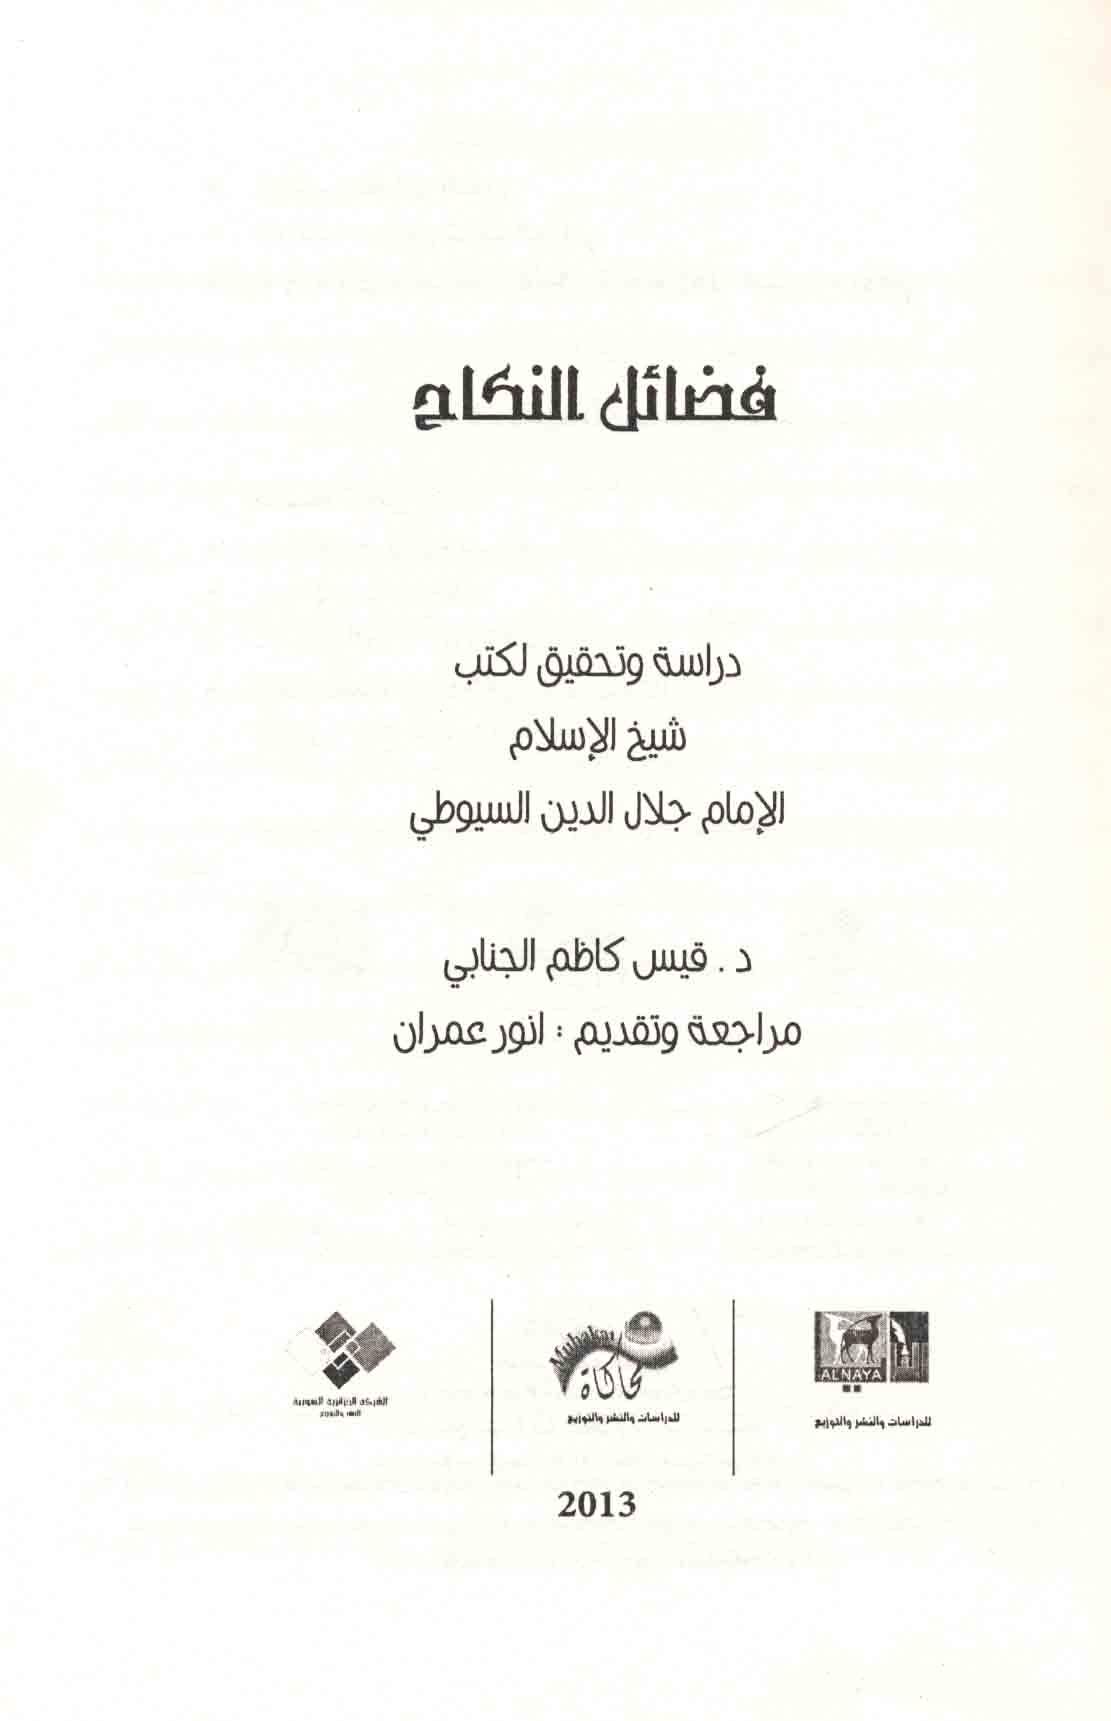 Nikah Arabic Text